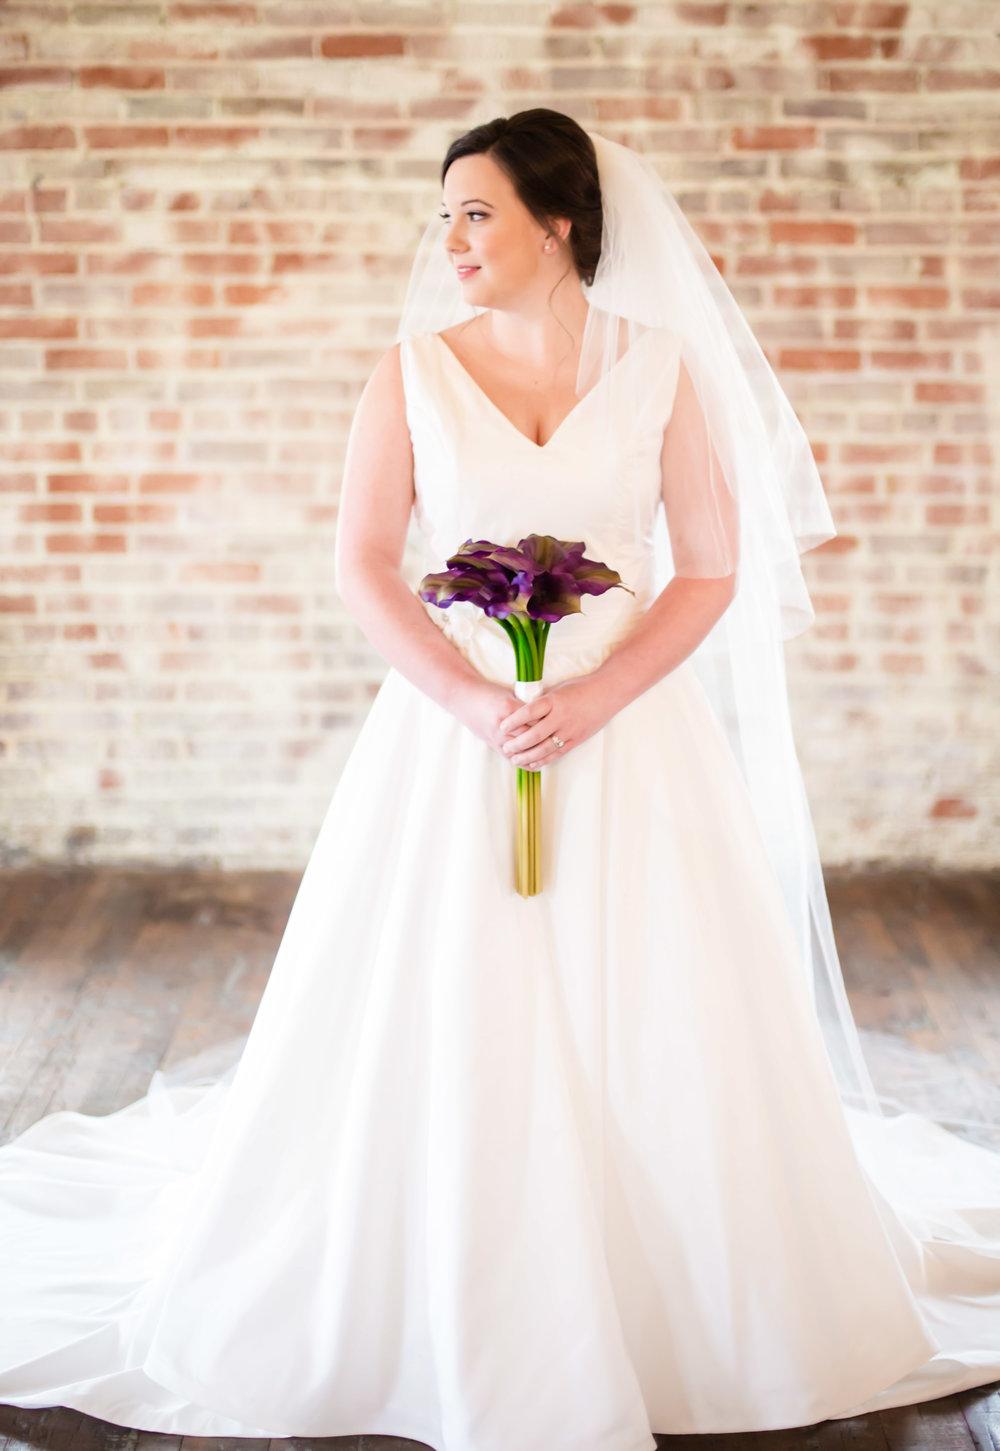 bridal (2 of 23).jpg